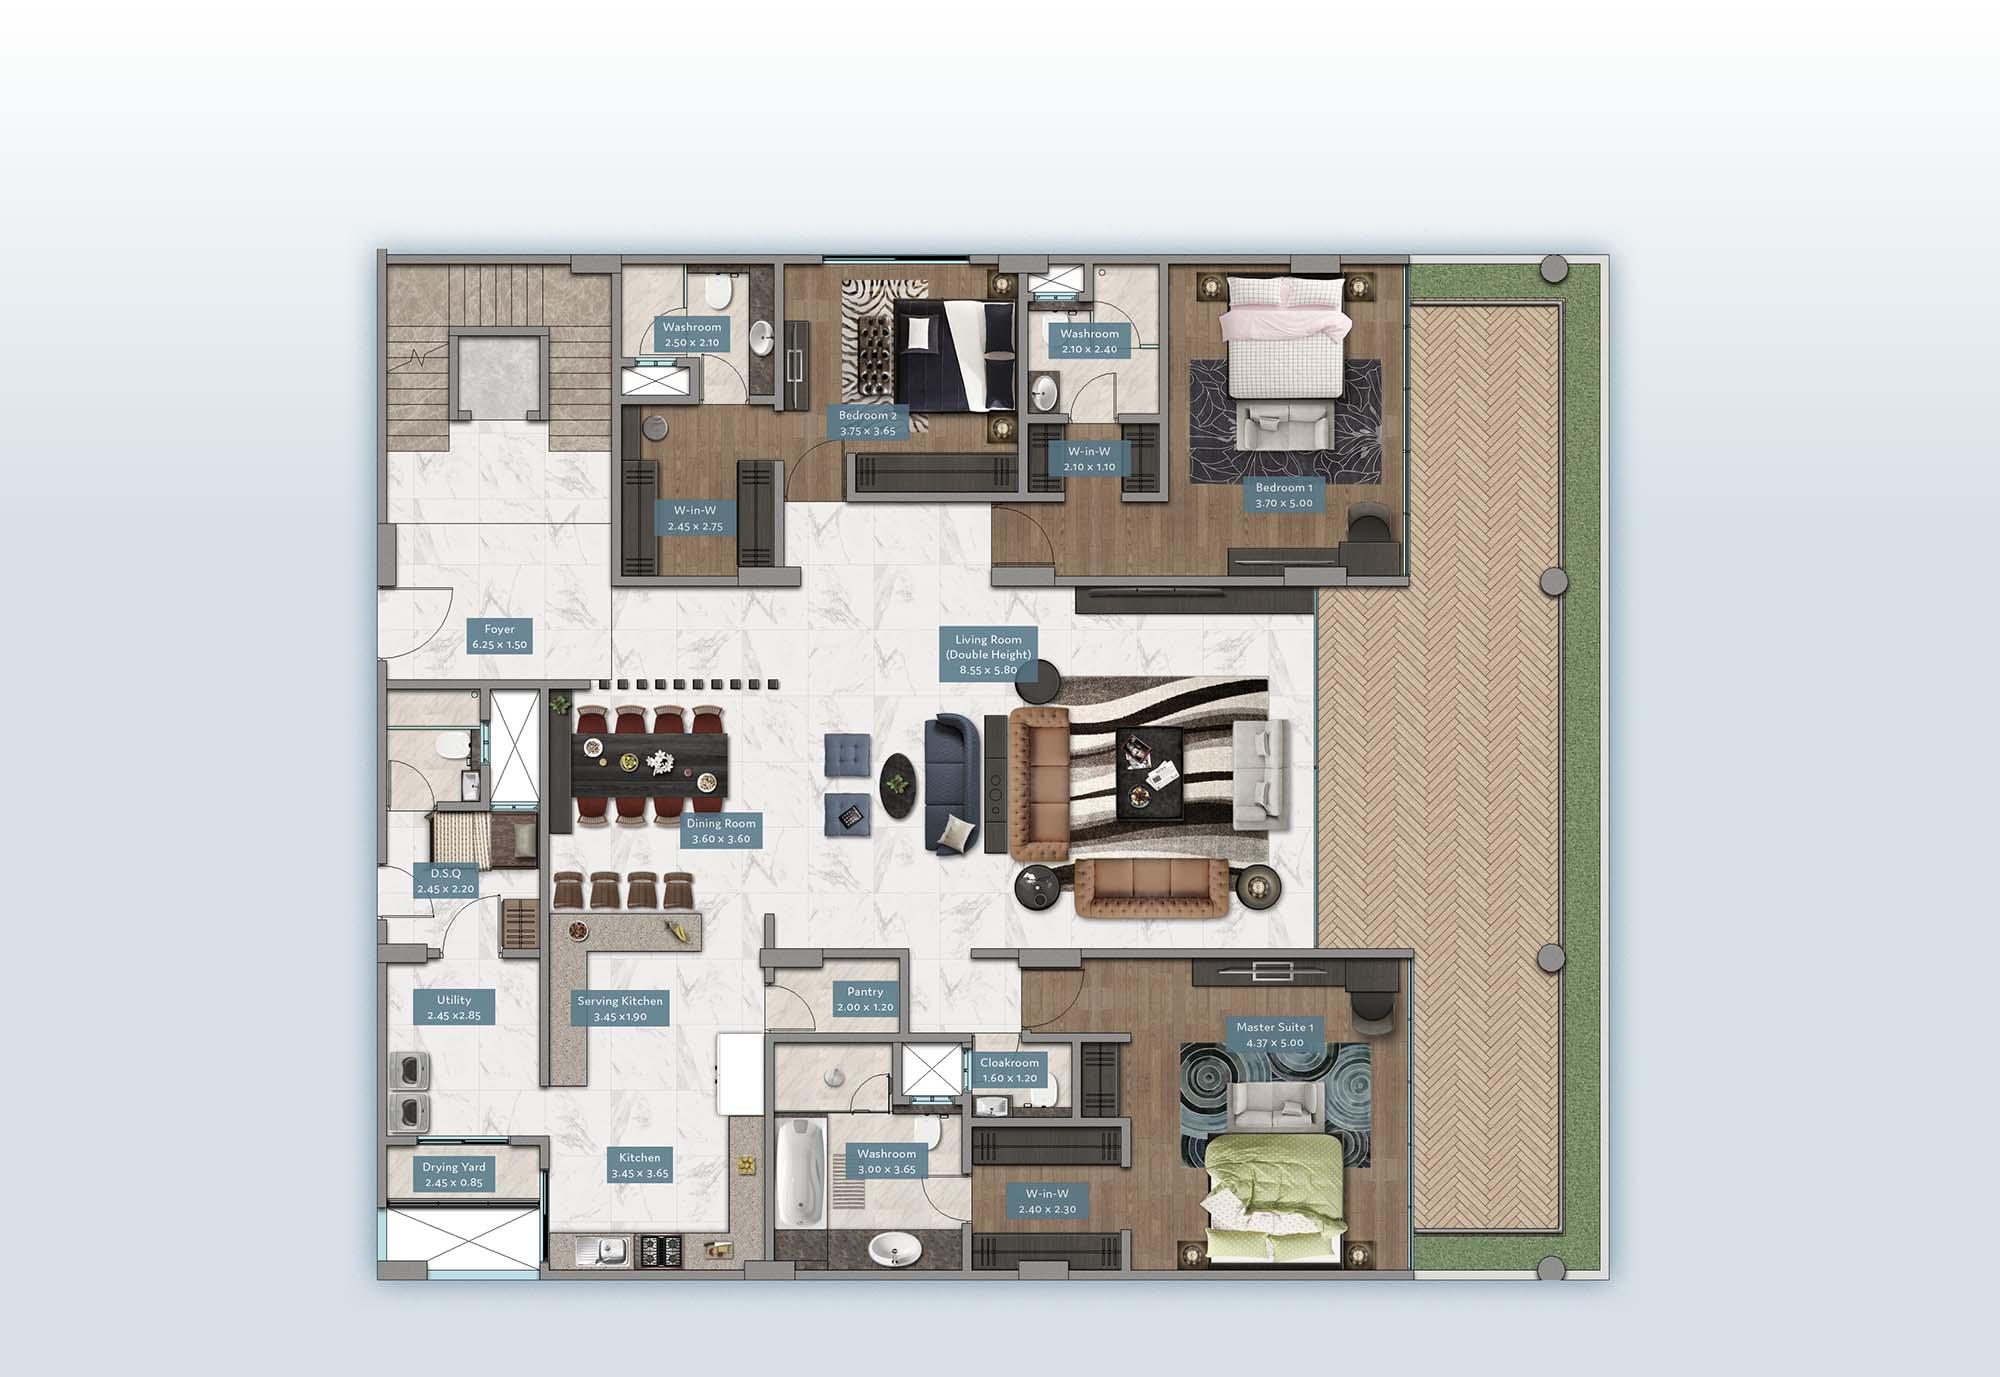 Kyuna View Penthouse | Floorplan | No. P2 & P5 - Level 1